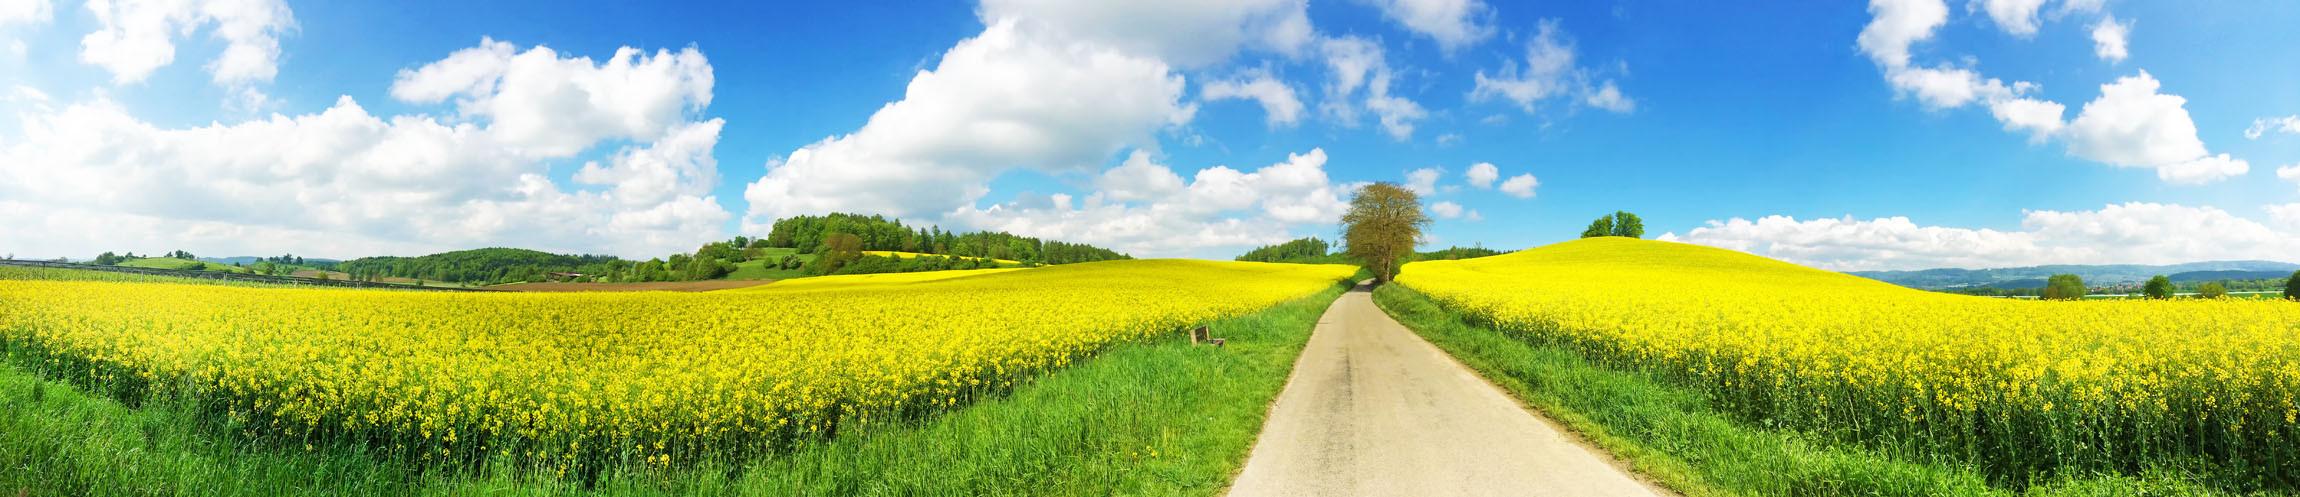 Panorama Foto Rapsfeld.jpg